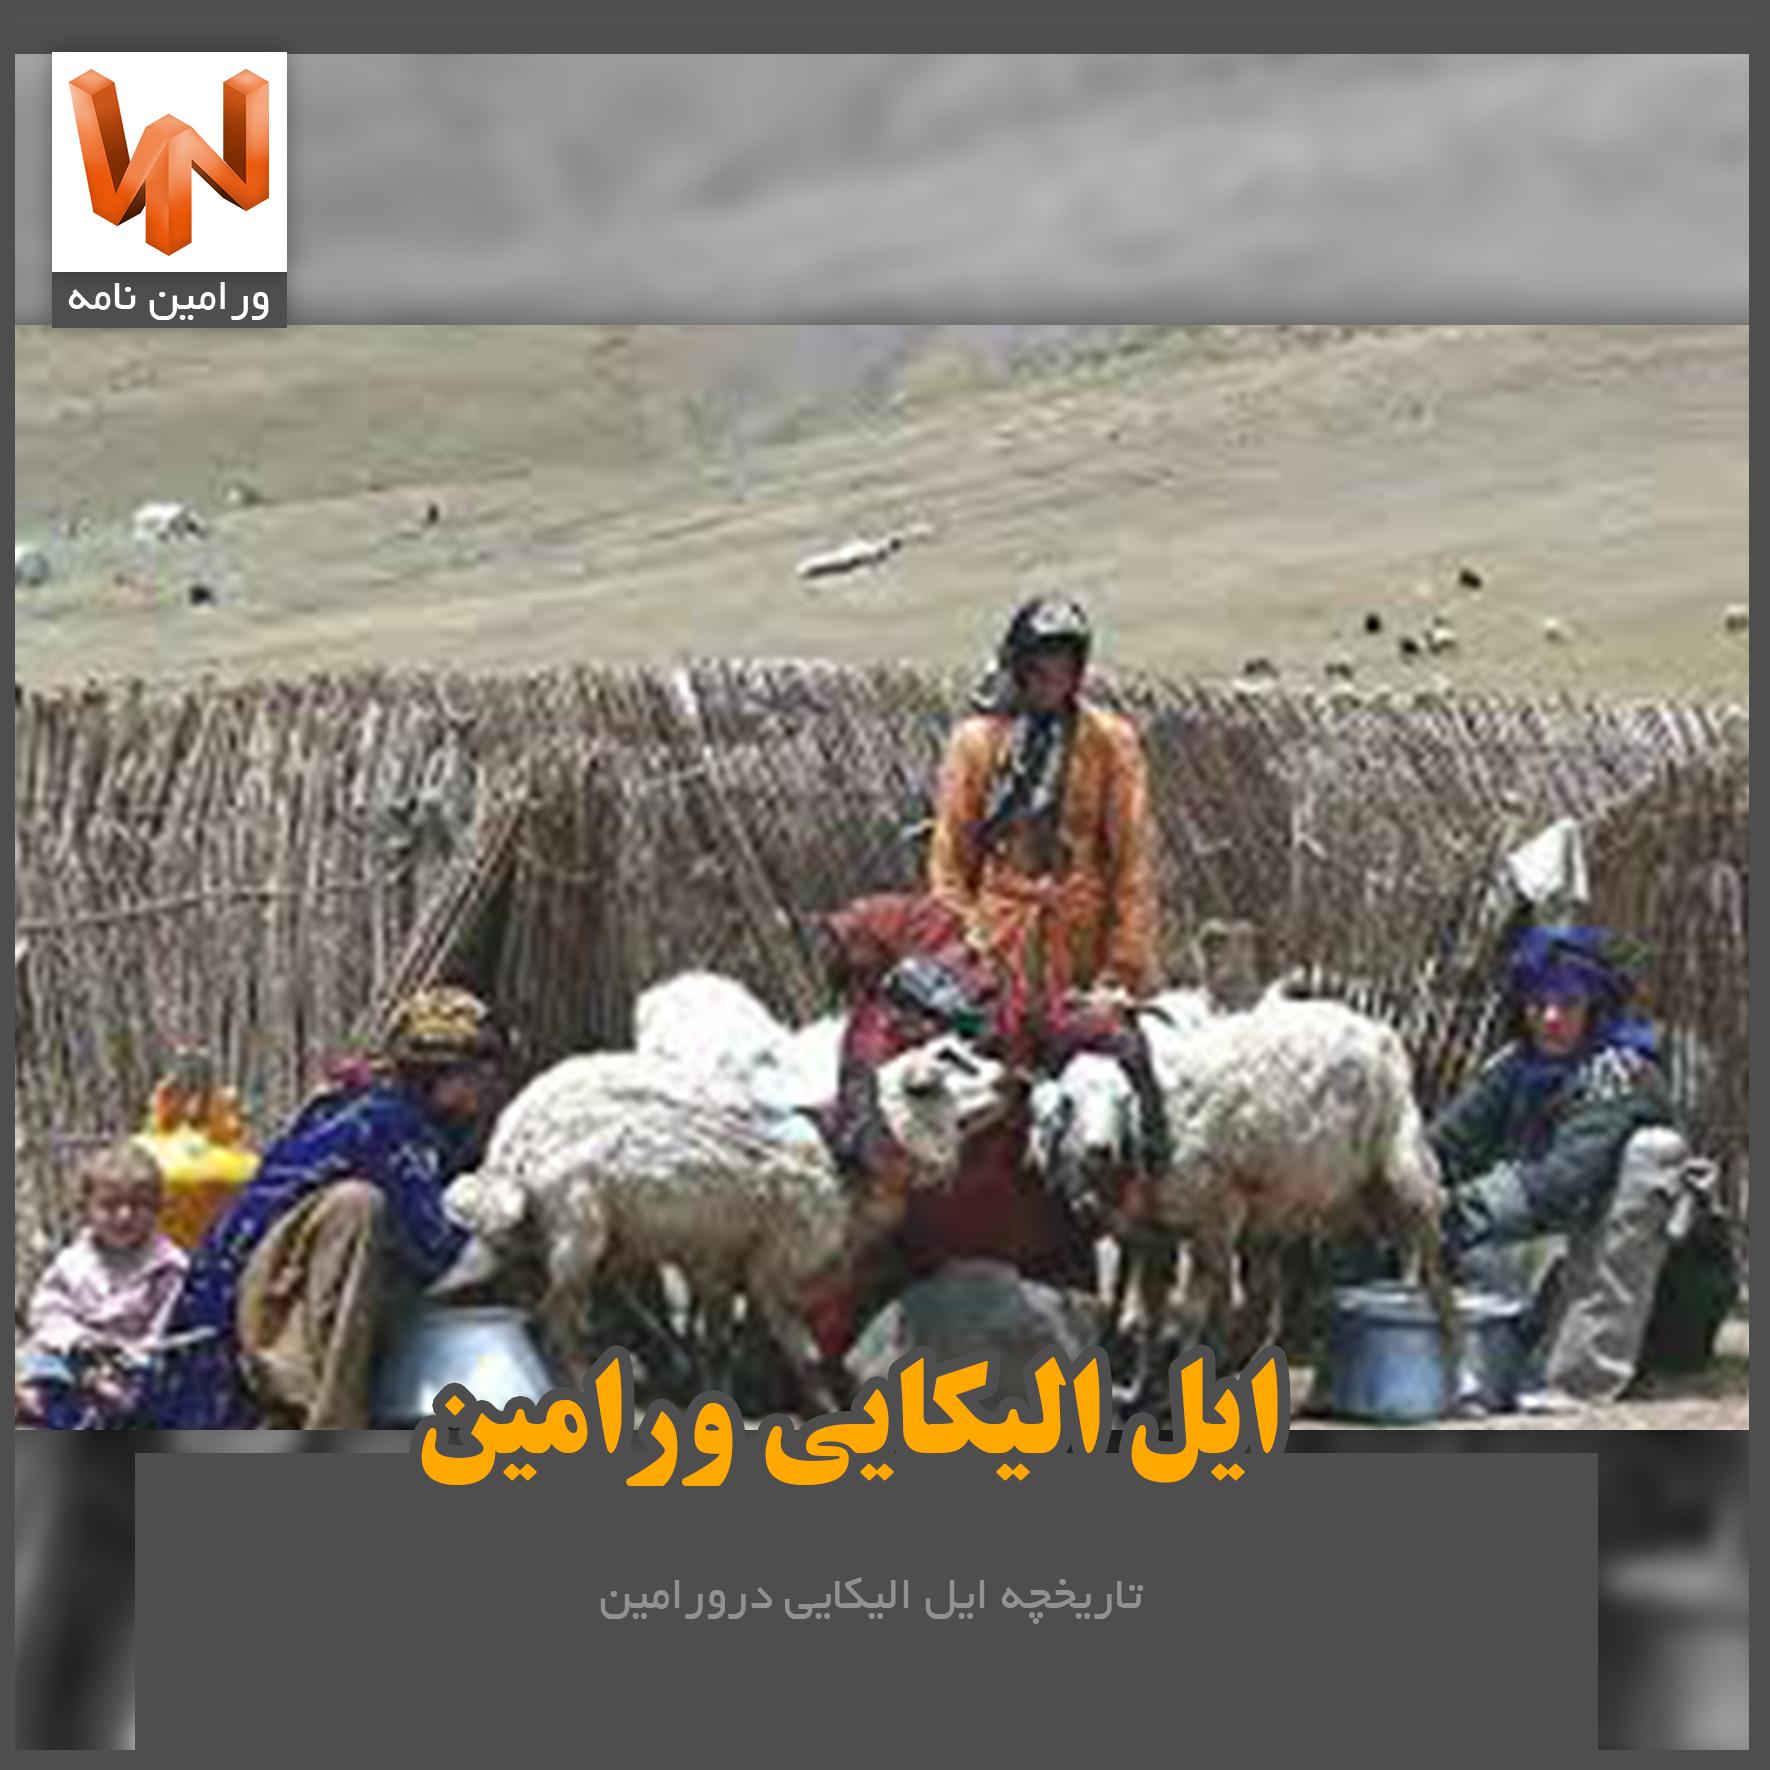 ایل علیکاهی ورامین